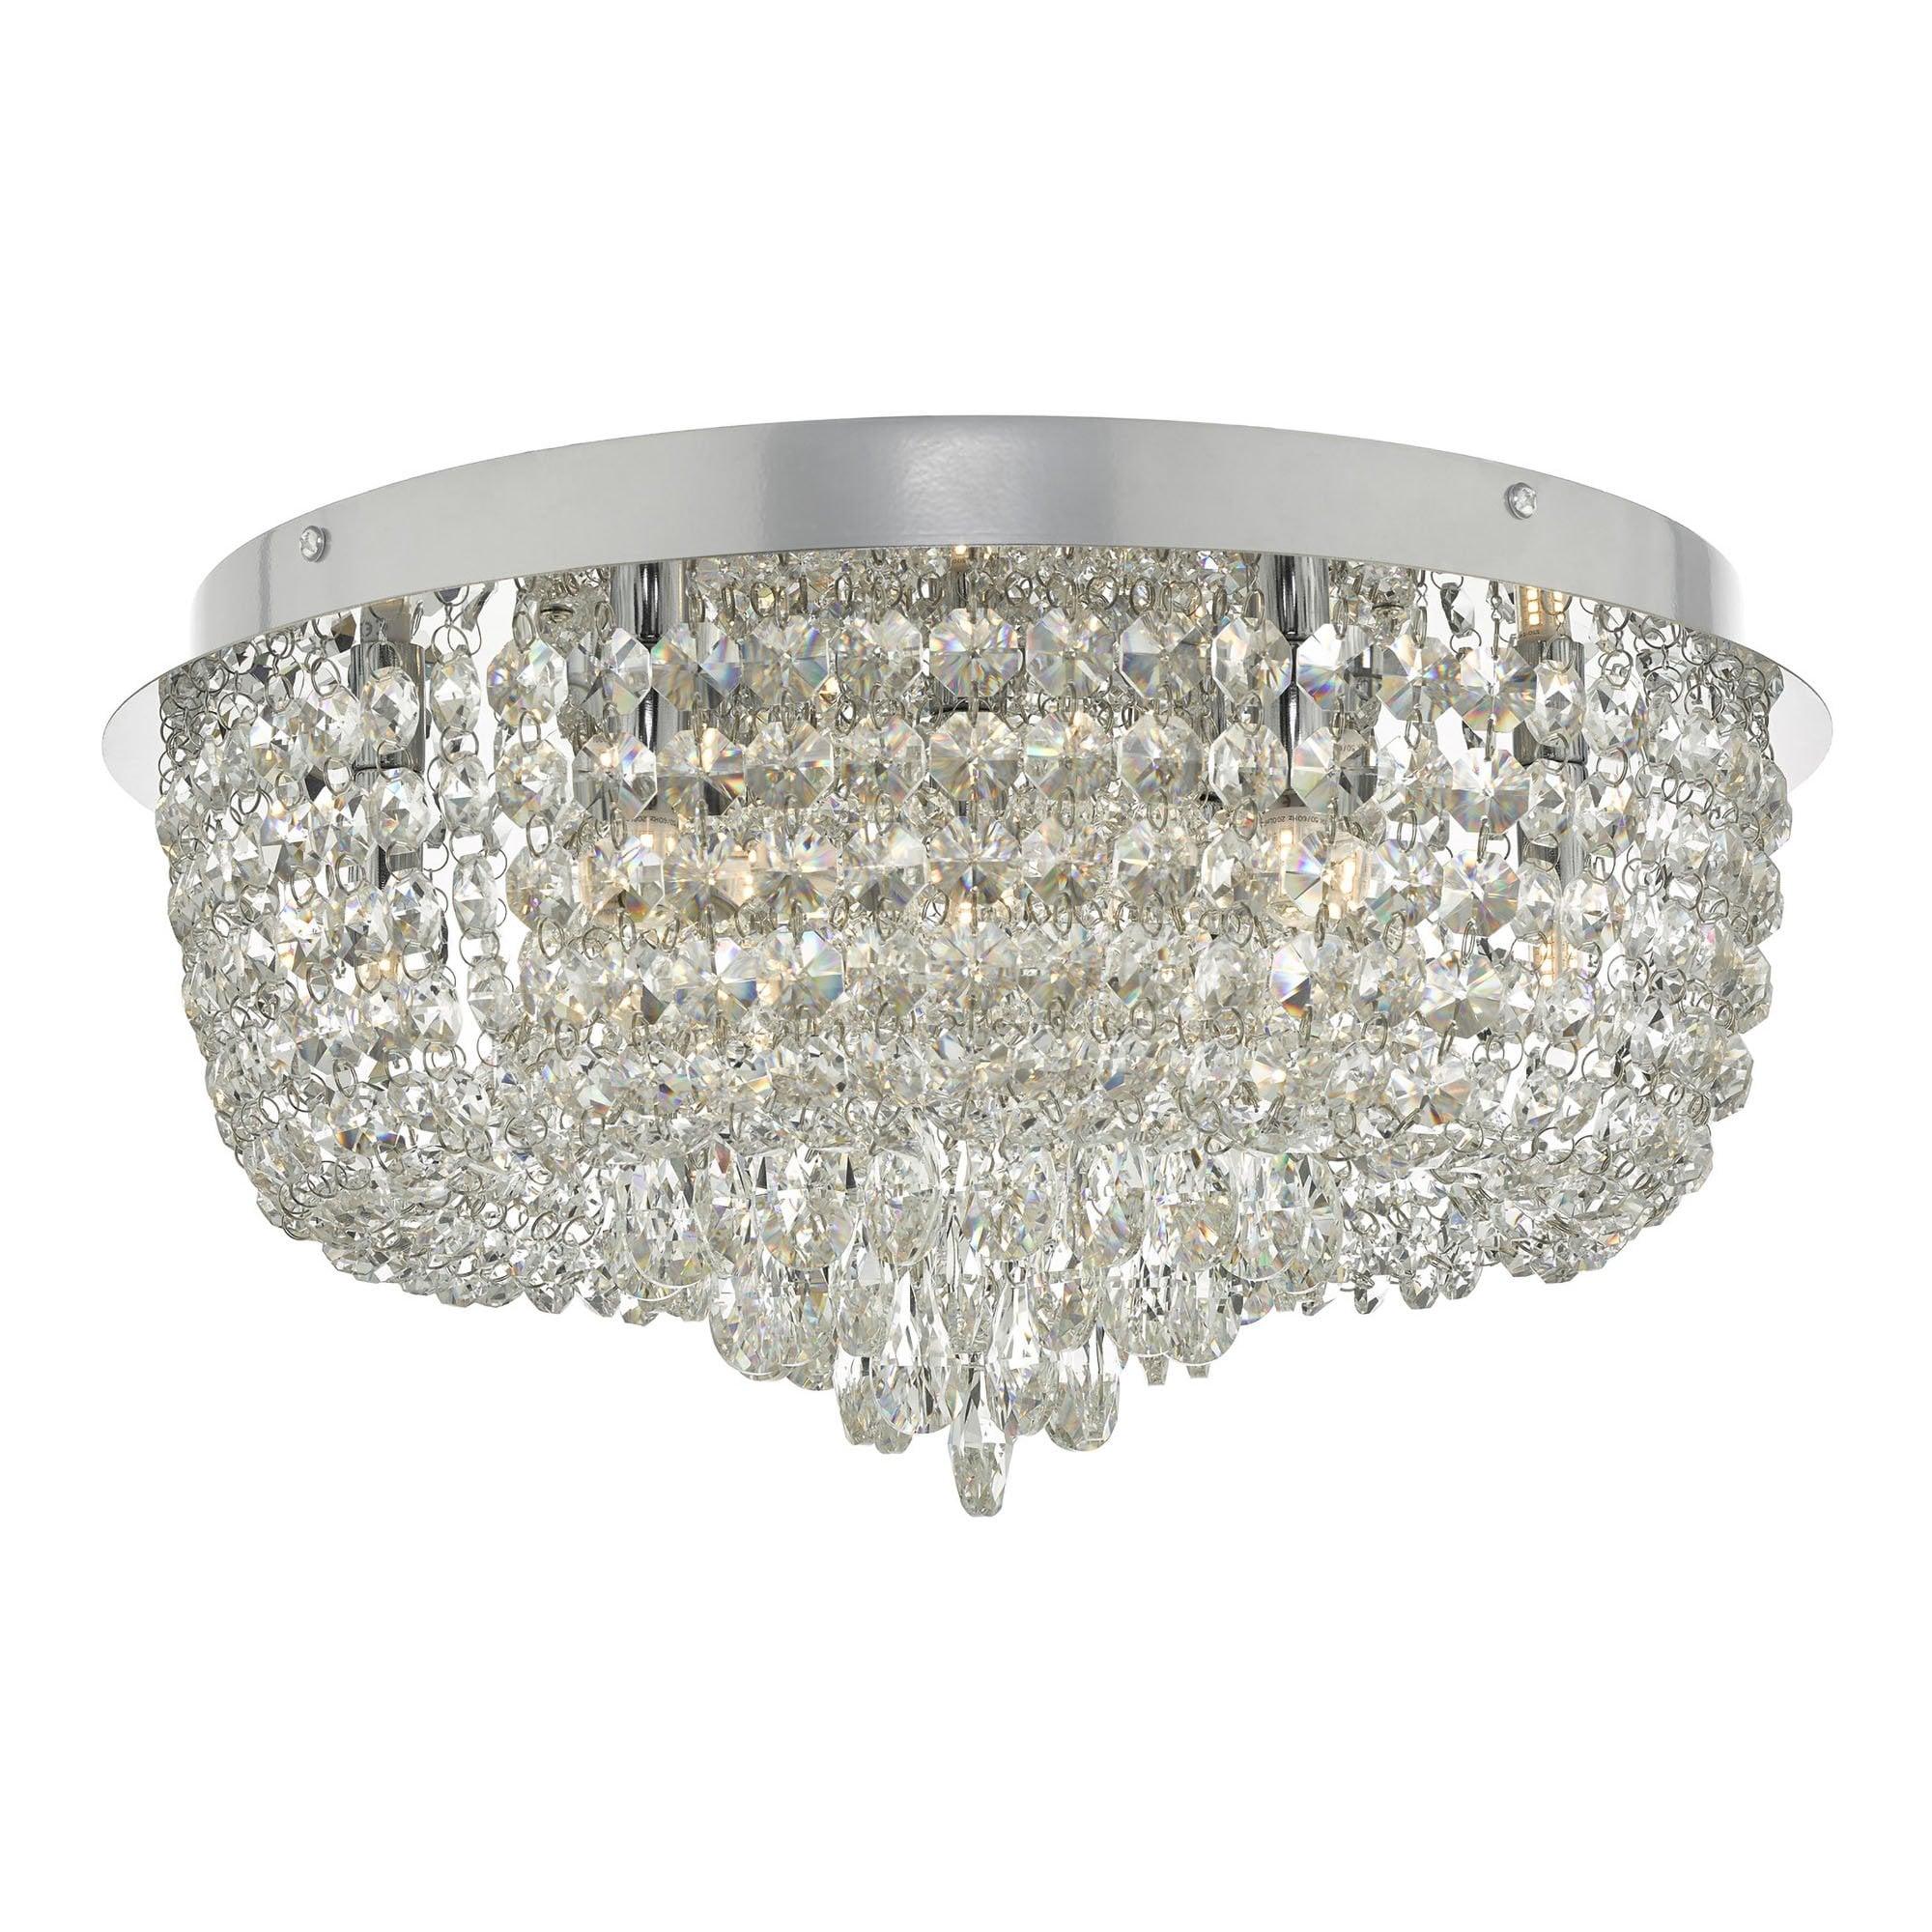 Eitan Semi Flush Ceiling Light 9 Crystal Beaded Polished Chrome